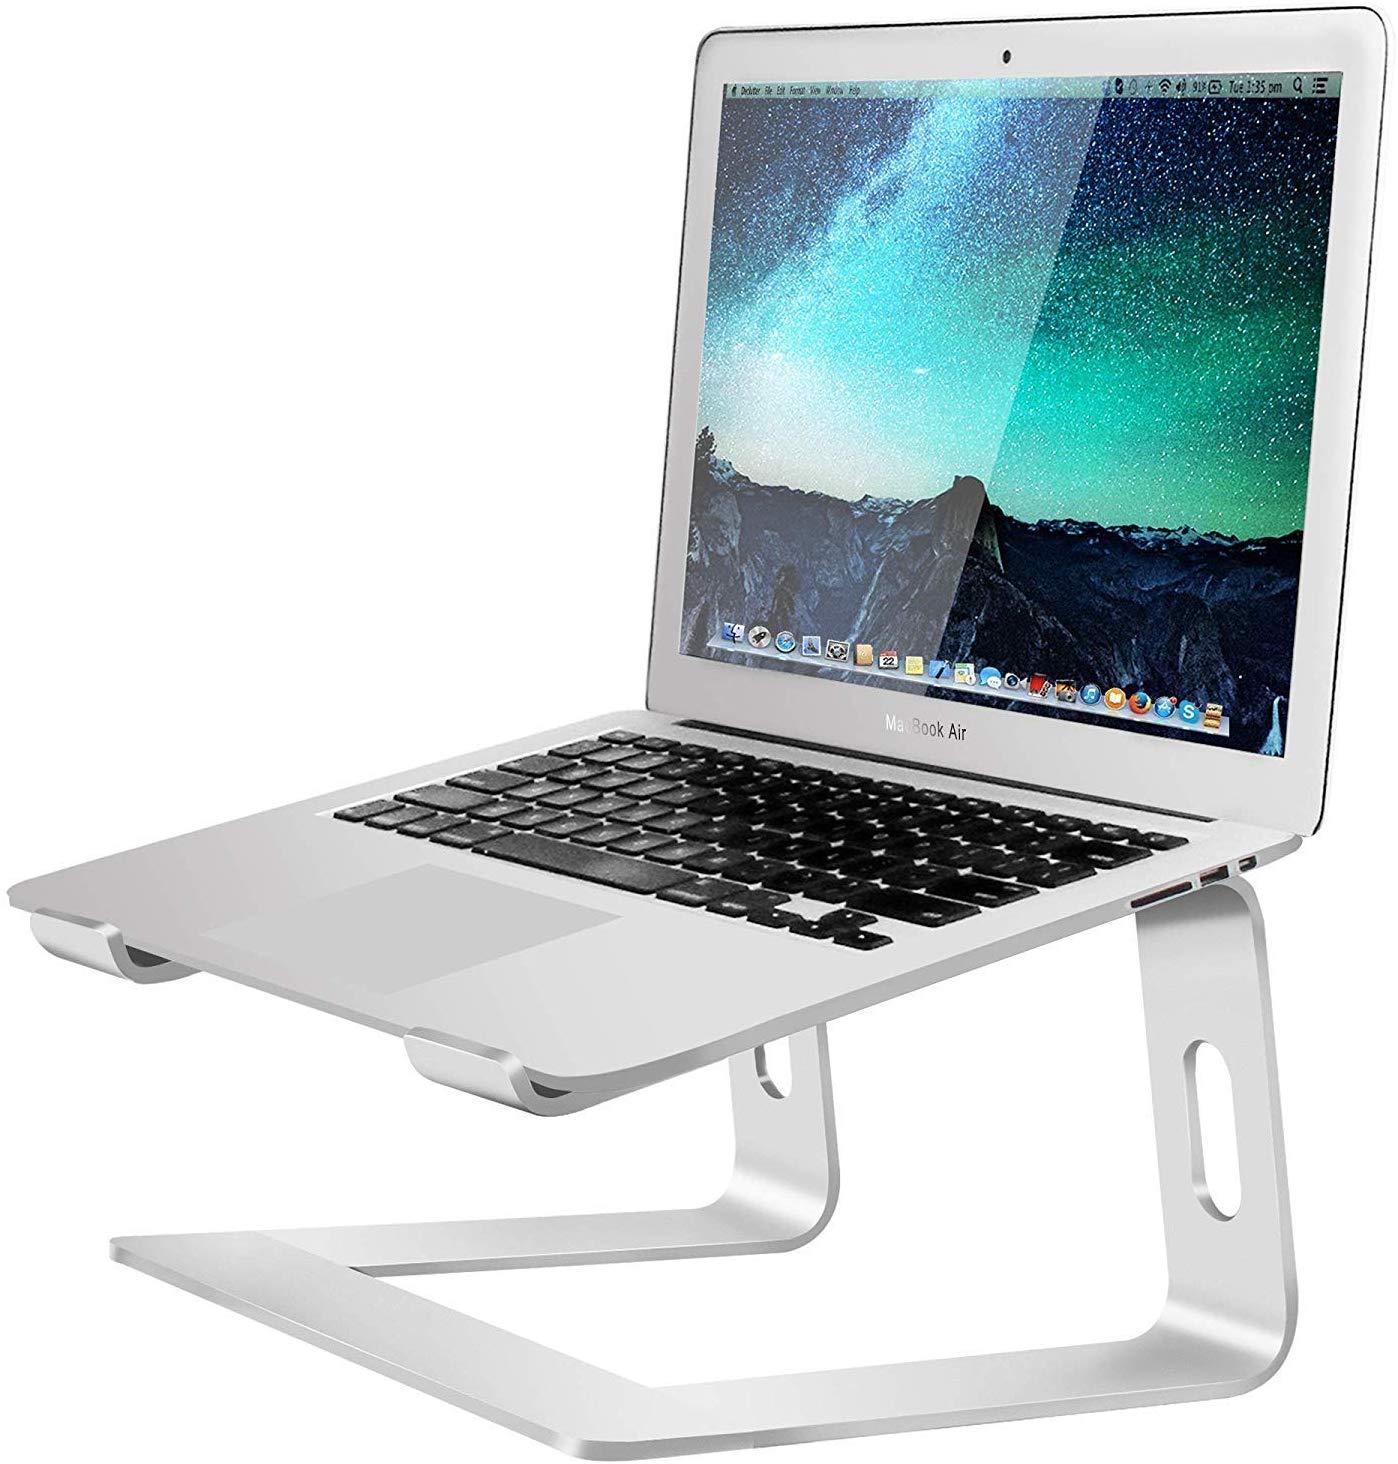 Soundance Aluminum Laptop Stand for Desk Compatible with Mac MacBook Pro Air Apple Notebook, Portable Holder Ergonomic Elevator Metal Riser for 10 to 15.6 inch PC Desktop Computer, LS1 Silver